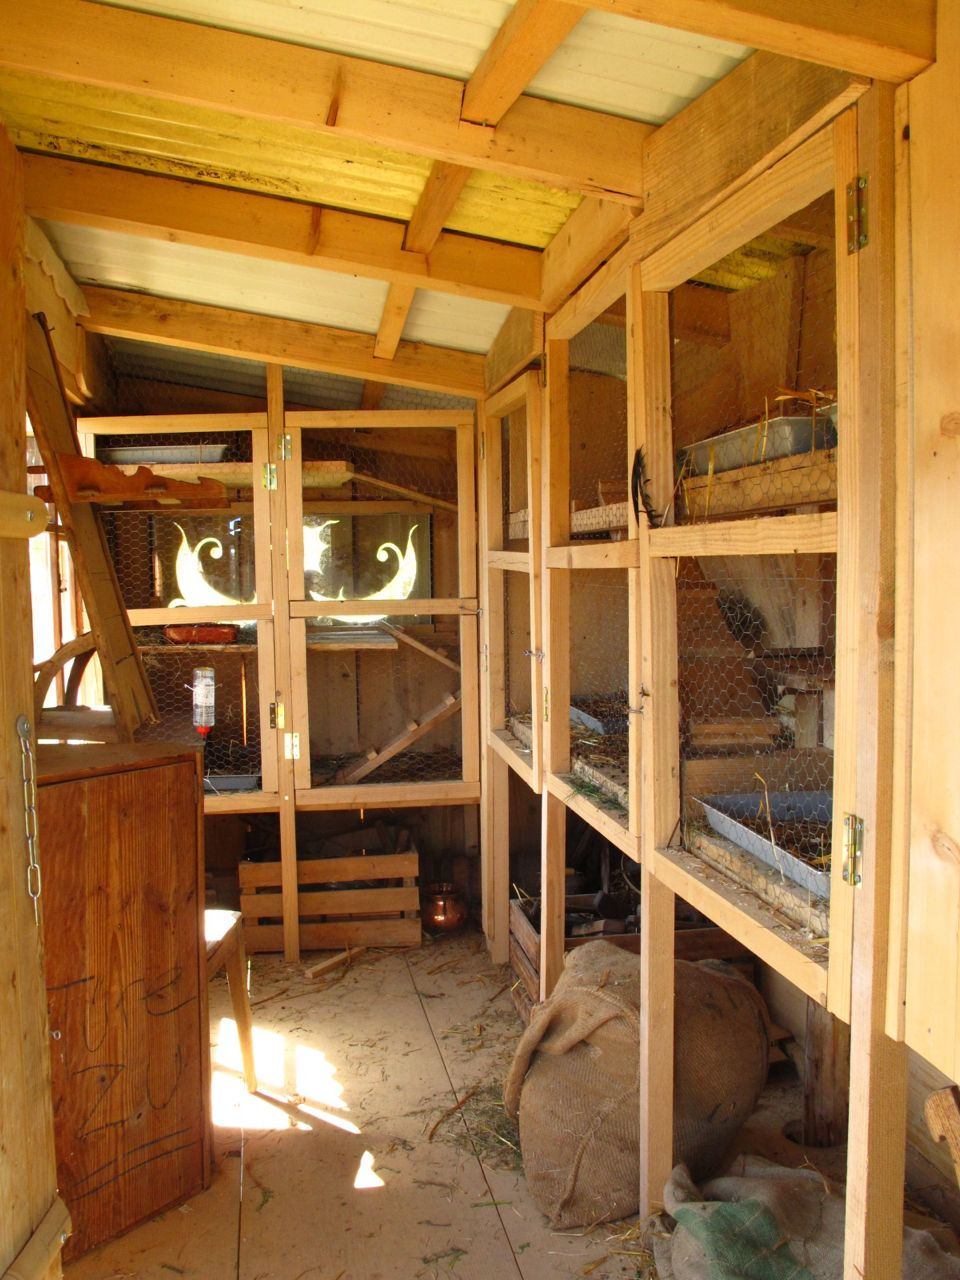 schafstall selber bauen anleitung wohn design. Black Bedroom Furniture Sets. Home Design Ideas